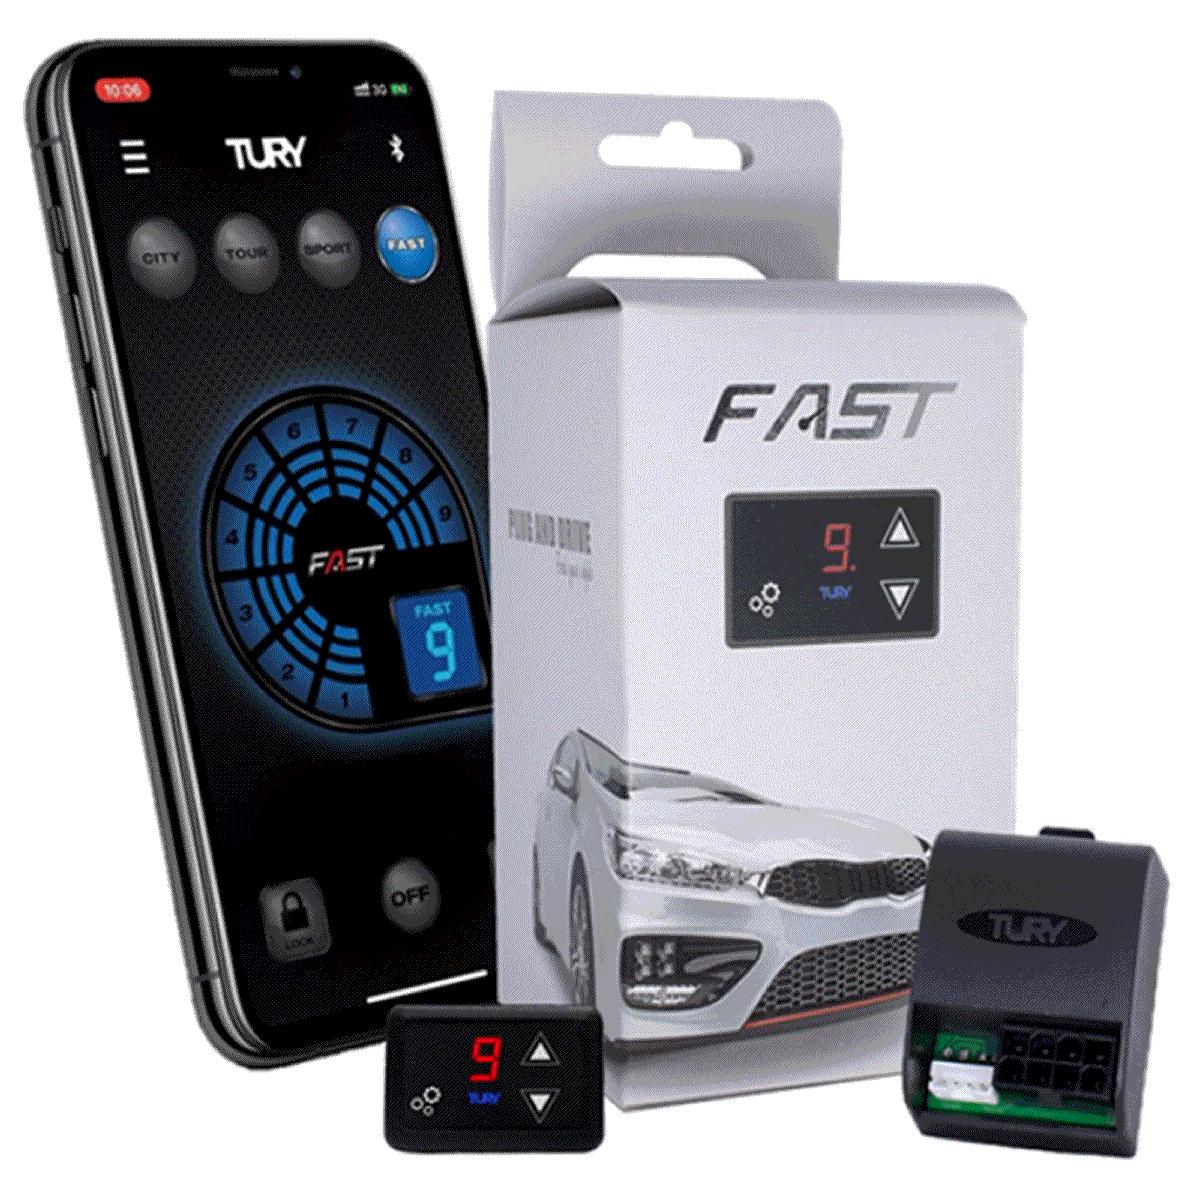 Fast 2.1 N Land Rover Módulo Acelerador Plug & Play